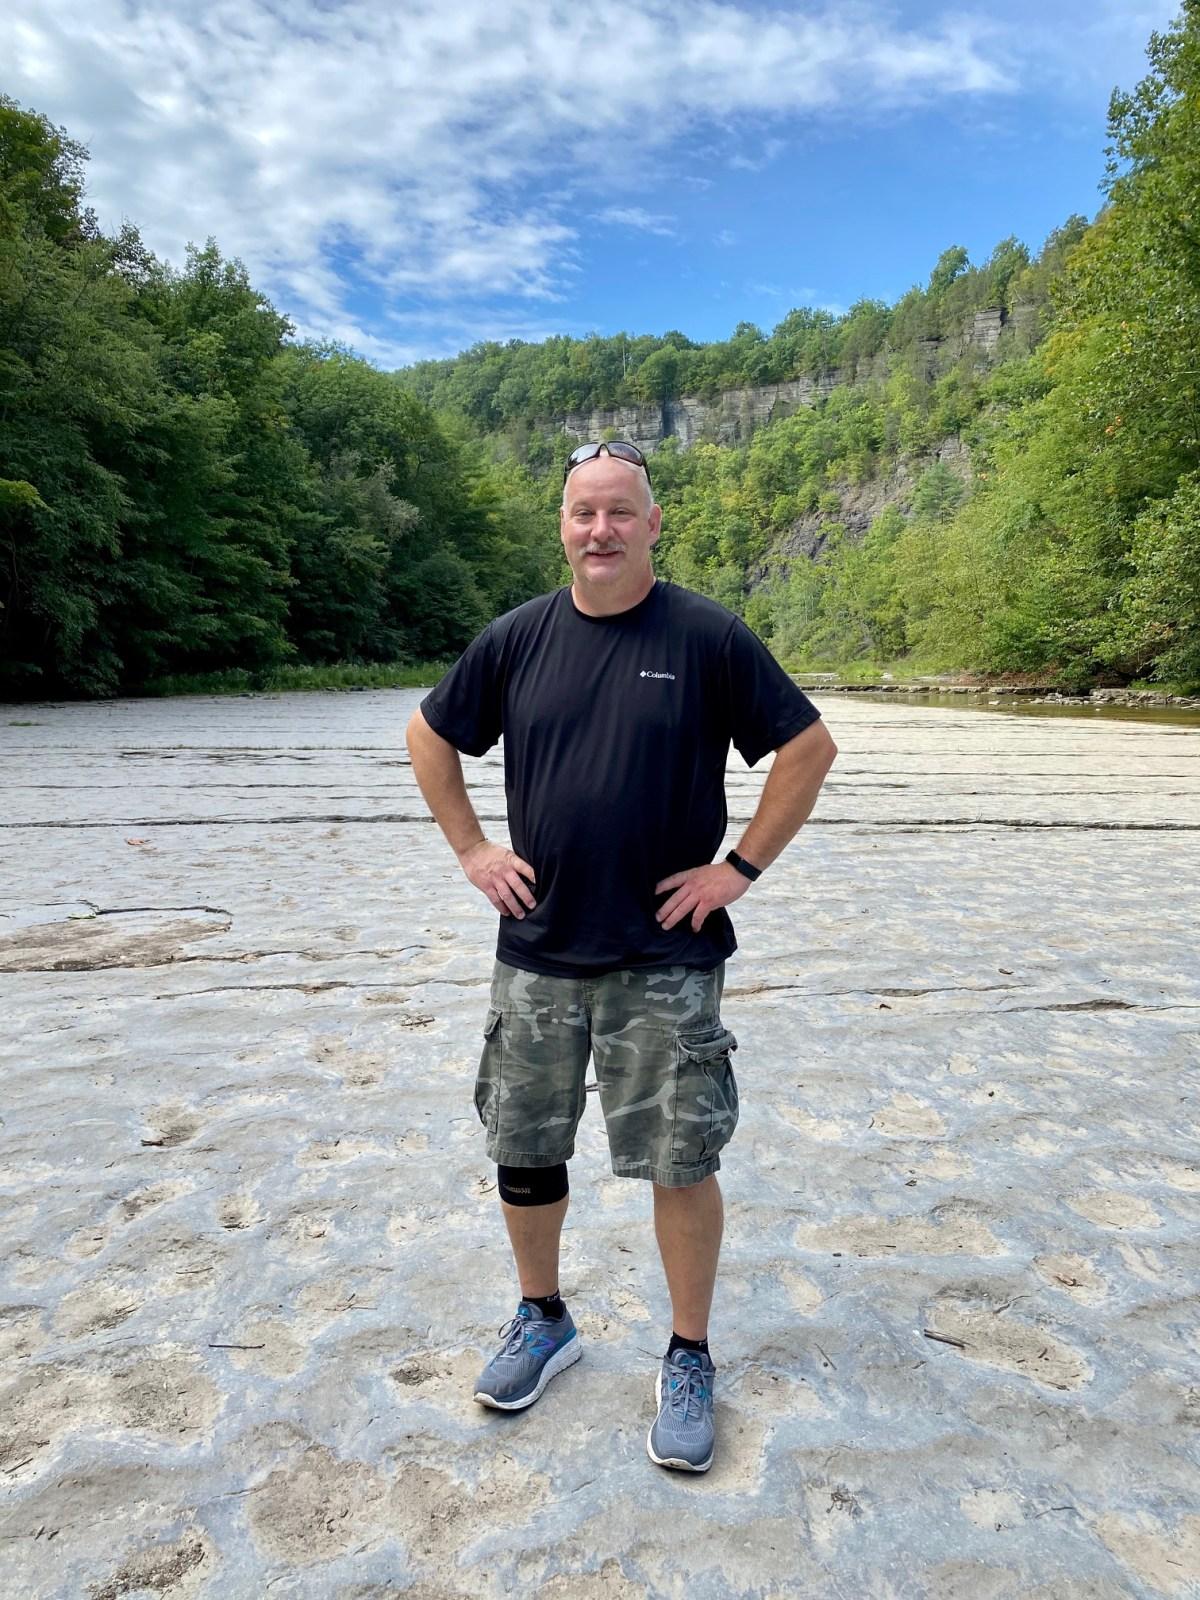 Taughannock Falls hike #Taughannockfalls #fingerlakesny #Taughannockfallshike #Taughannockfallshiking #howtogettoTaughannockfalls #ithacanywaterfalls #nywaterfalls #fingerlakeshiking